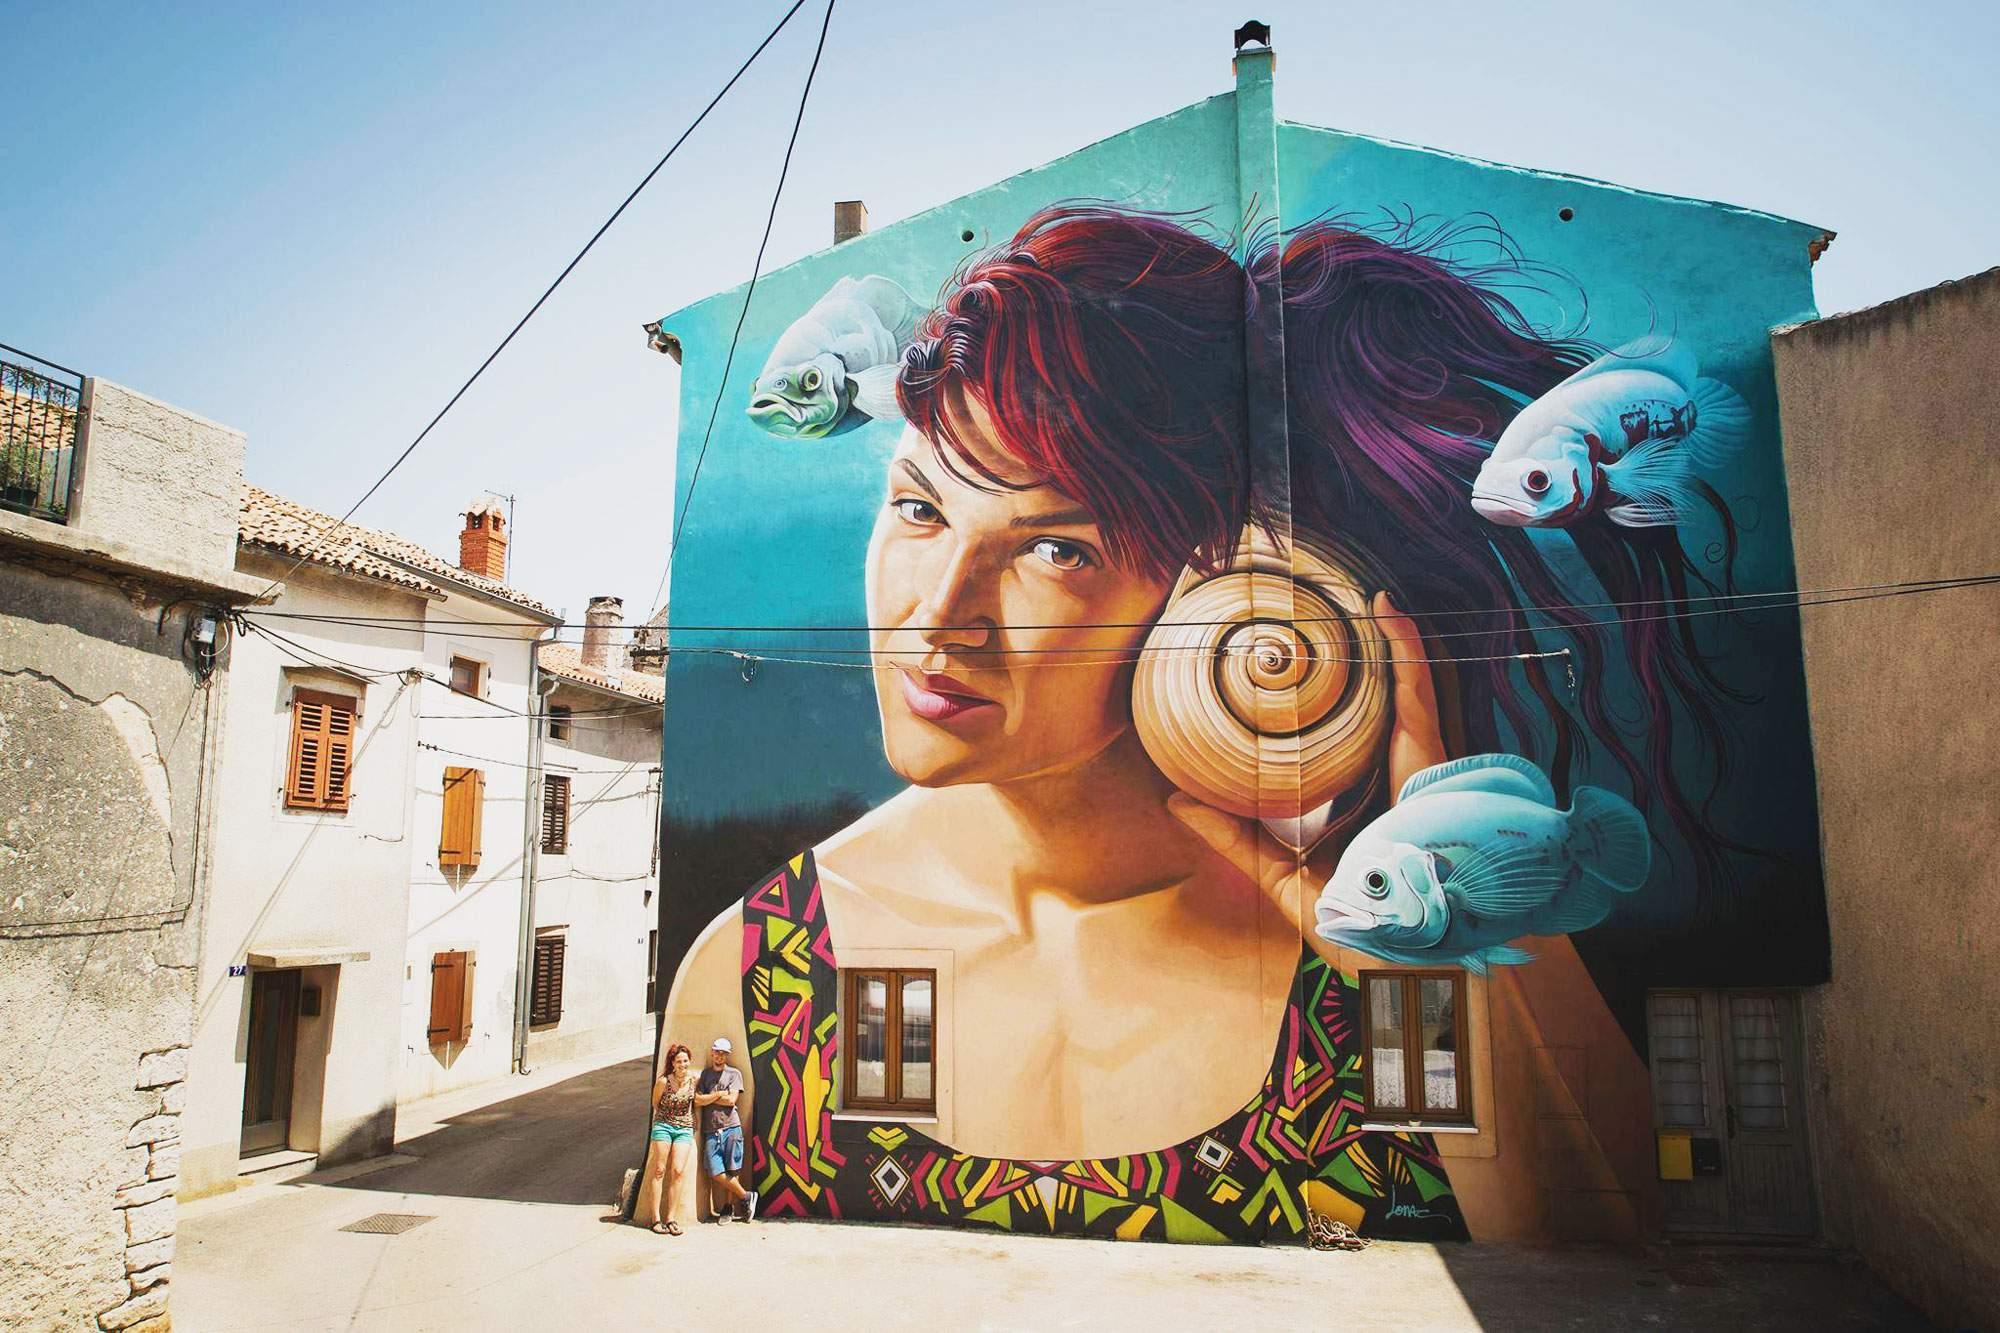 lonac-boombarstick-croatia-street-art